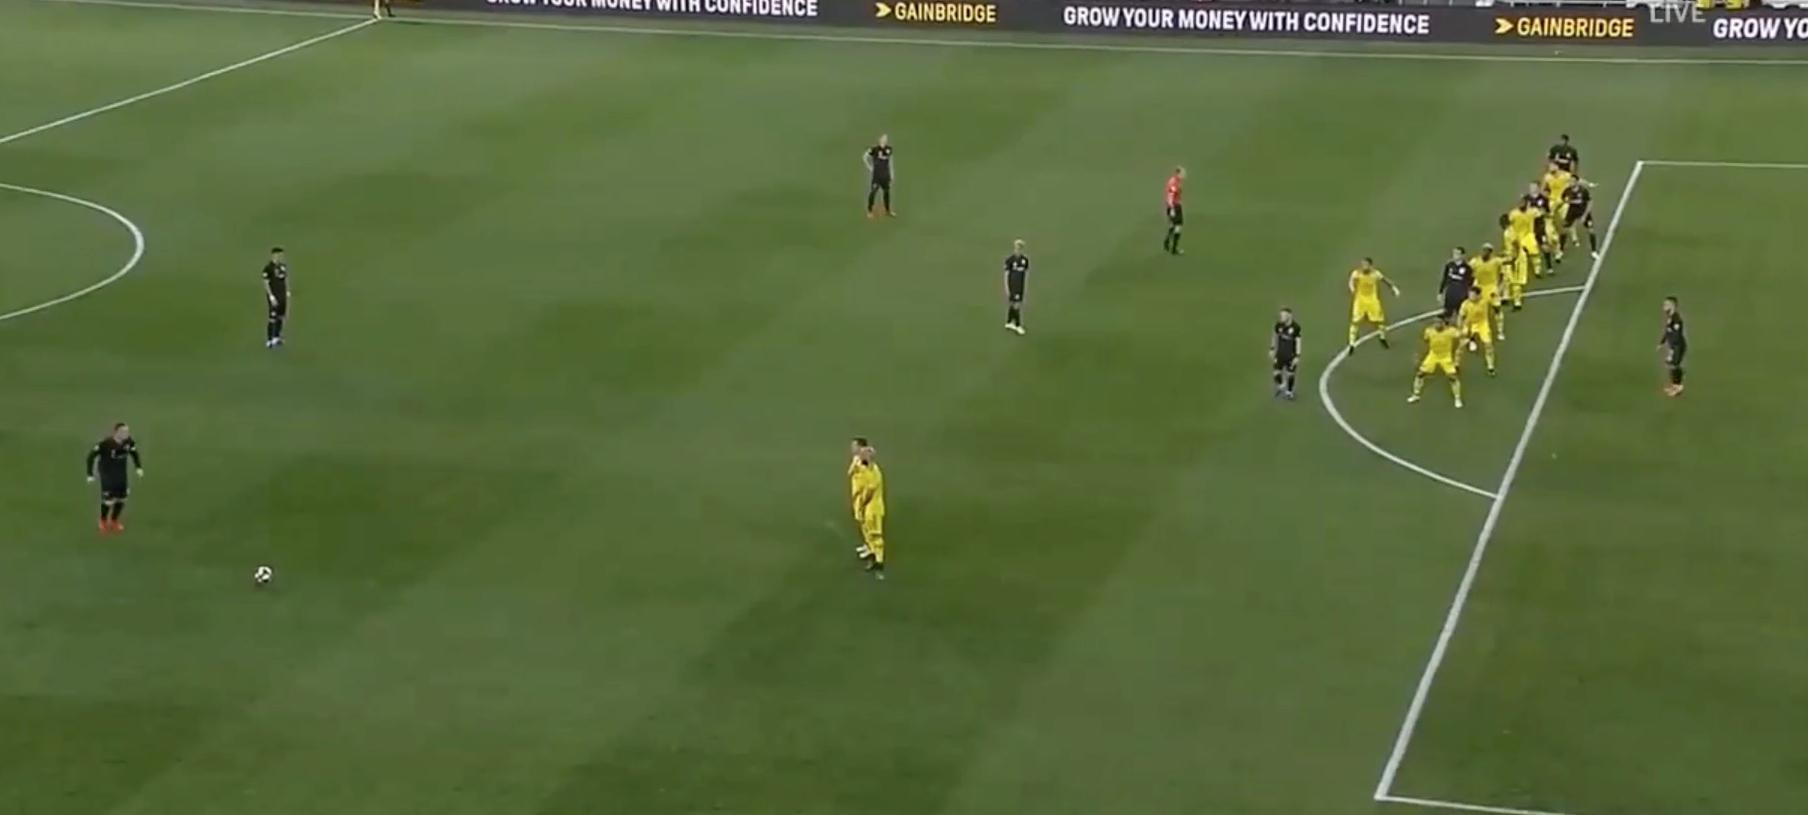 Free kick offside position